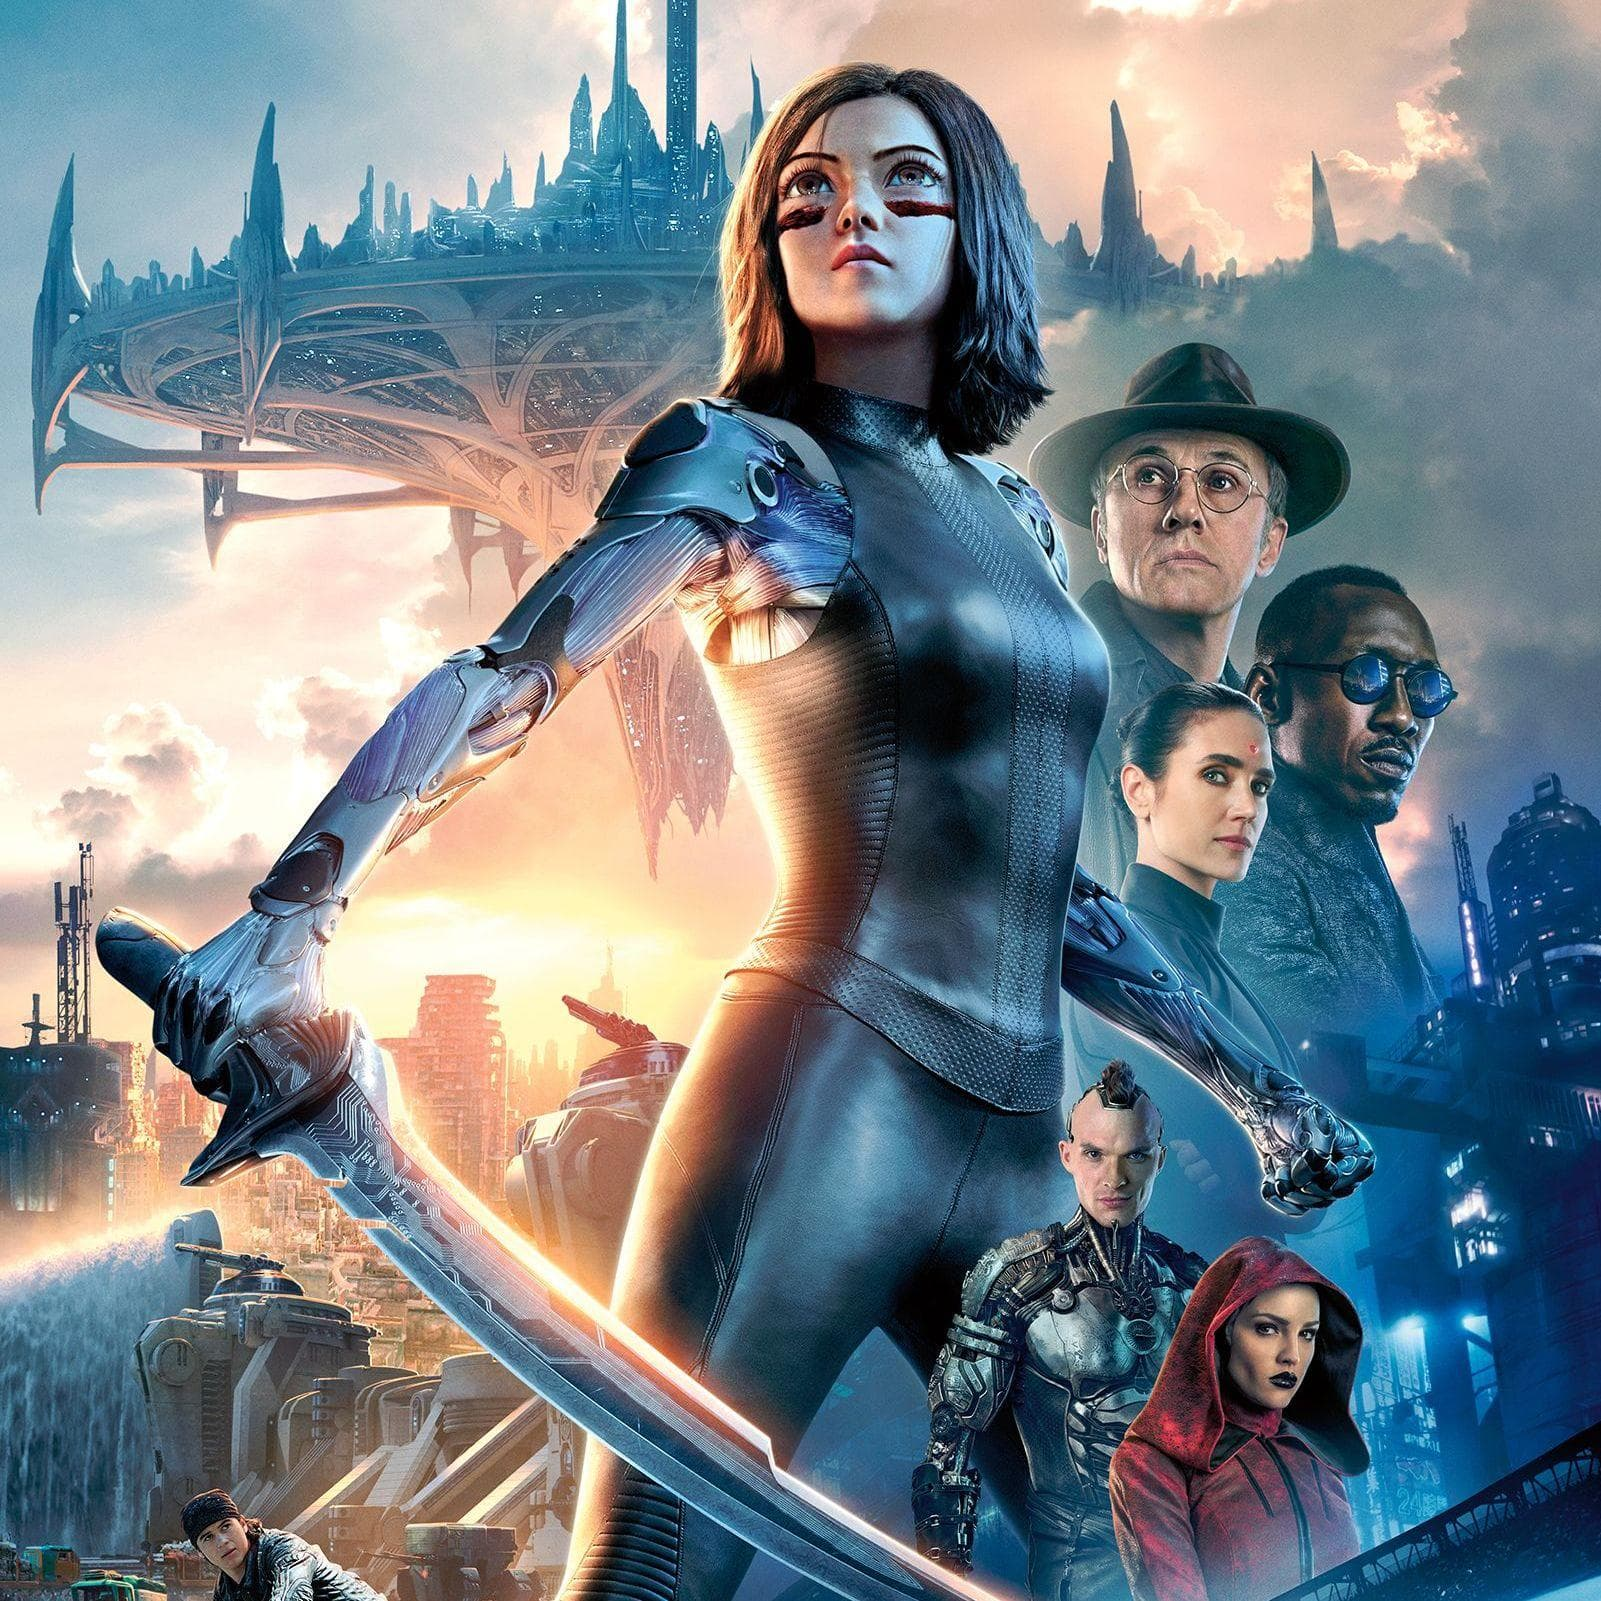 Random Best New Sci-Fi Movies of Last Few Years